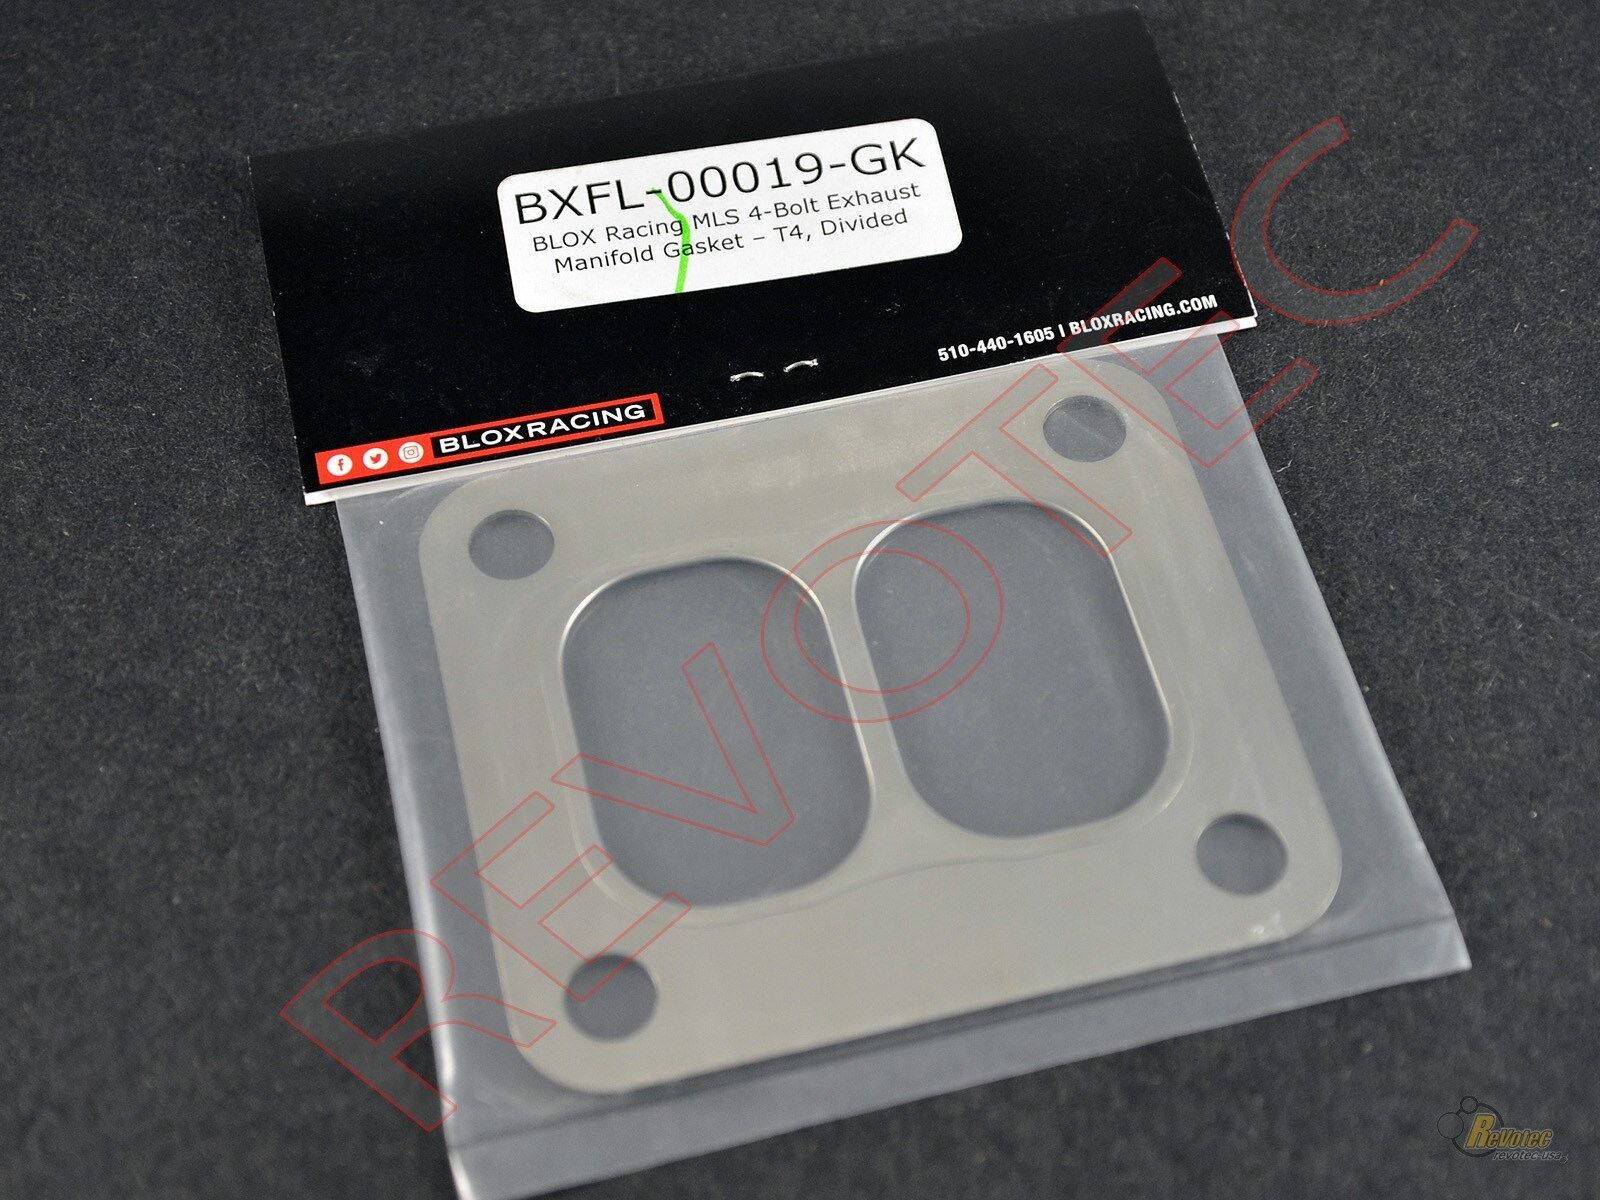 Divided Blox Racing BXFL-00019-GK MLS 4-Bolt Exhaust Manifold Gasket T4